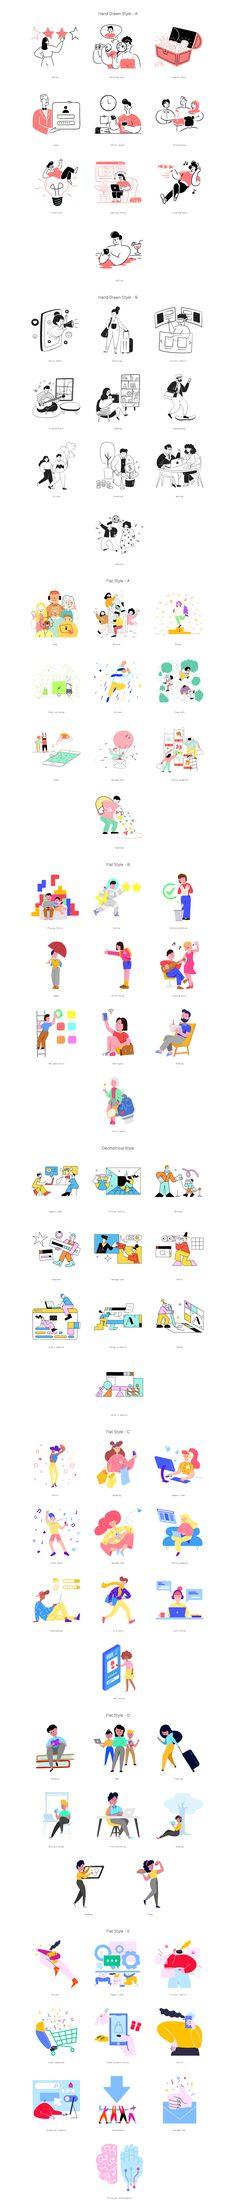 Download 80 free illustrations Character Flat Design, Line Illustration, Free Illustrations, Free Design, Artwork, Ninja, Illustrator, Manual, Sticker